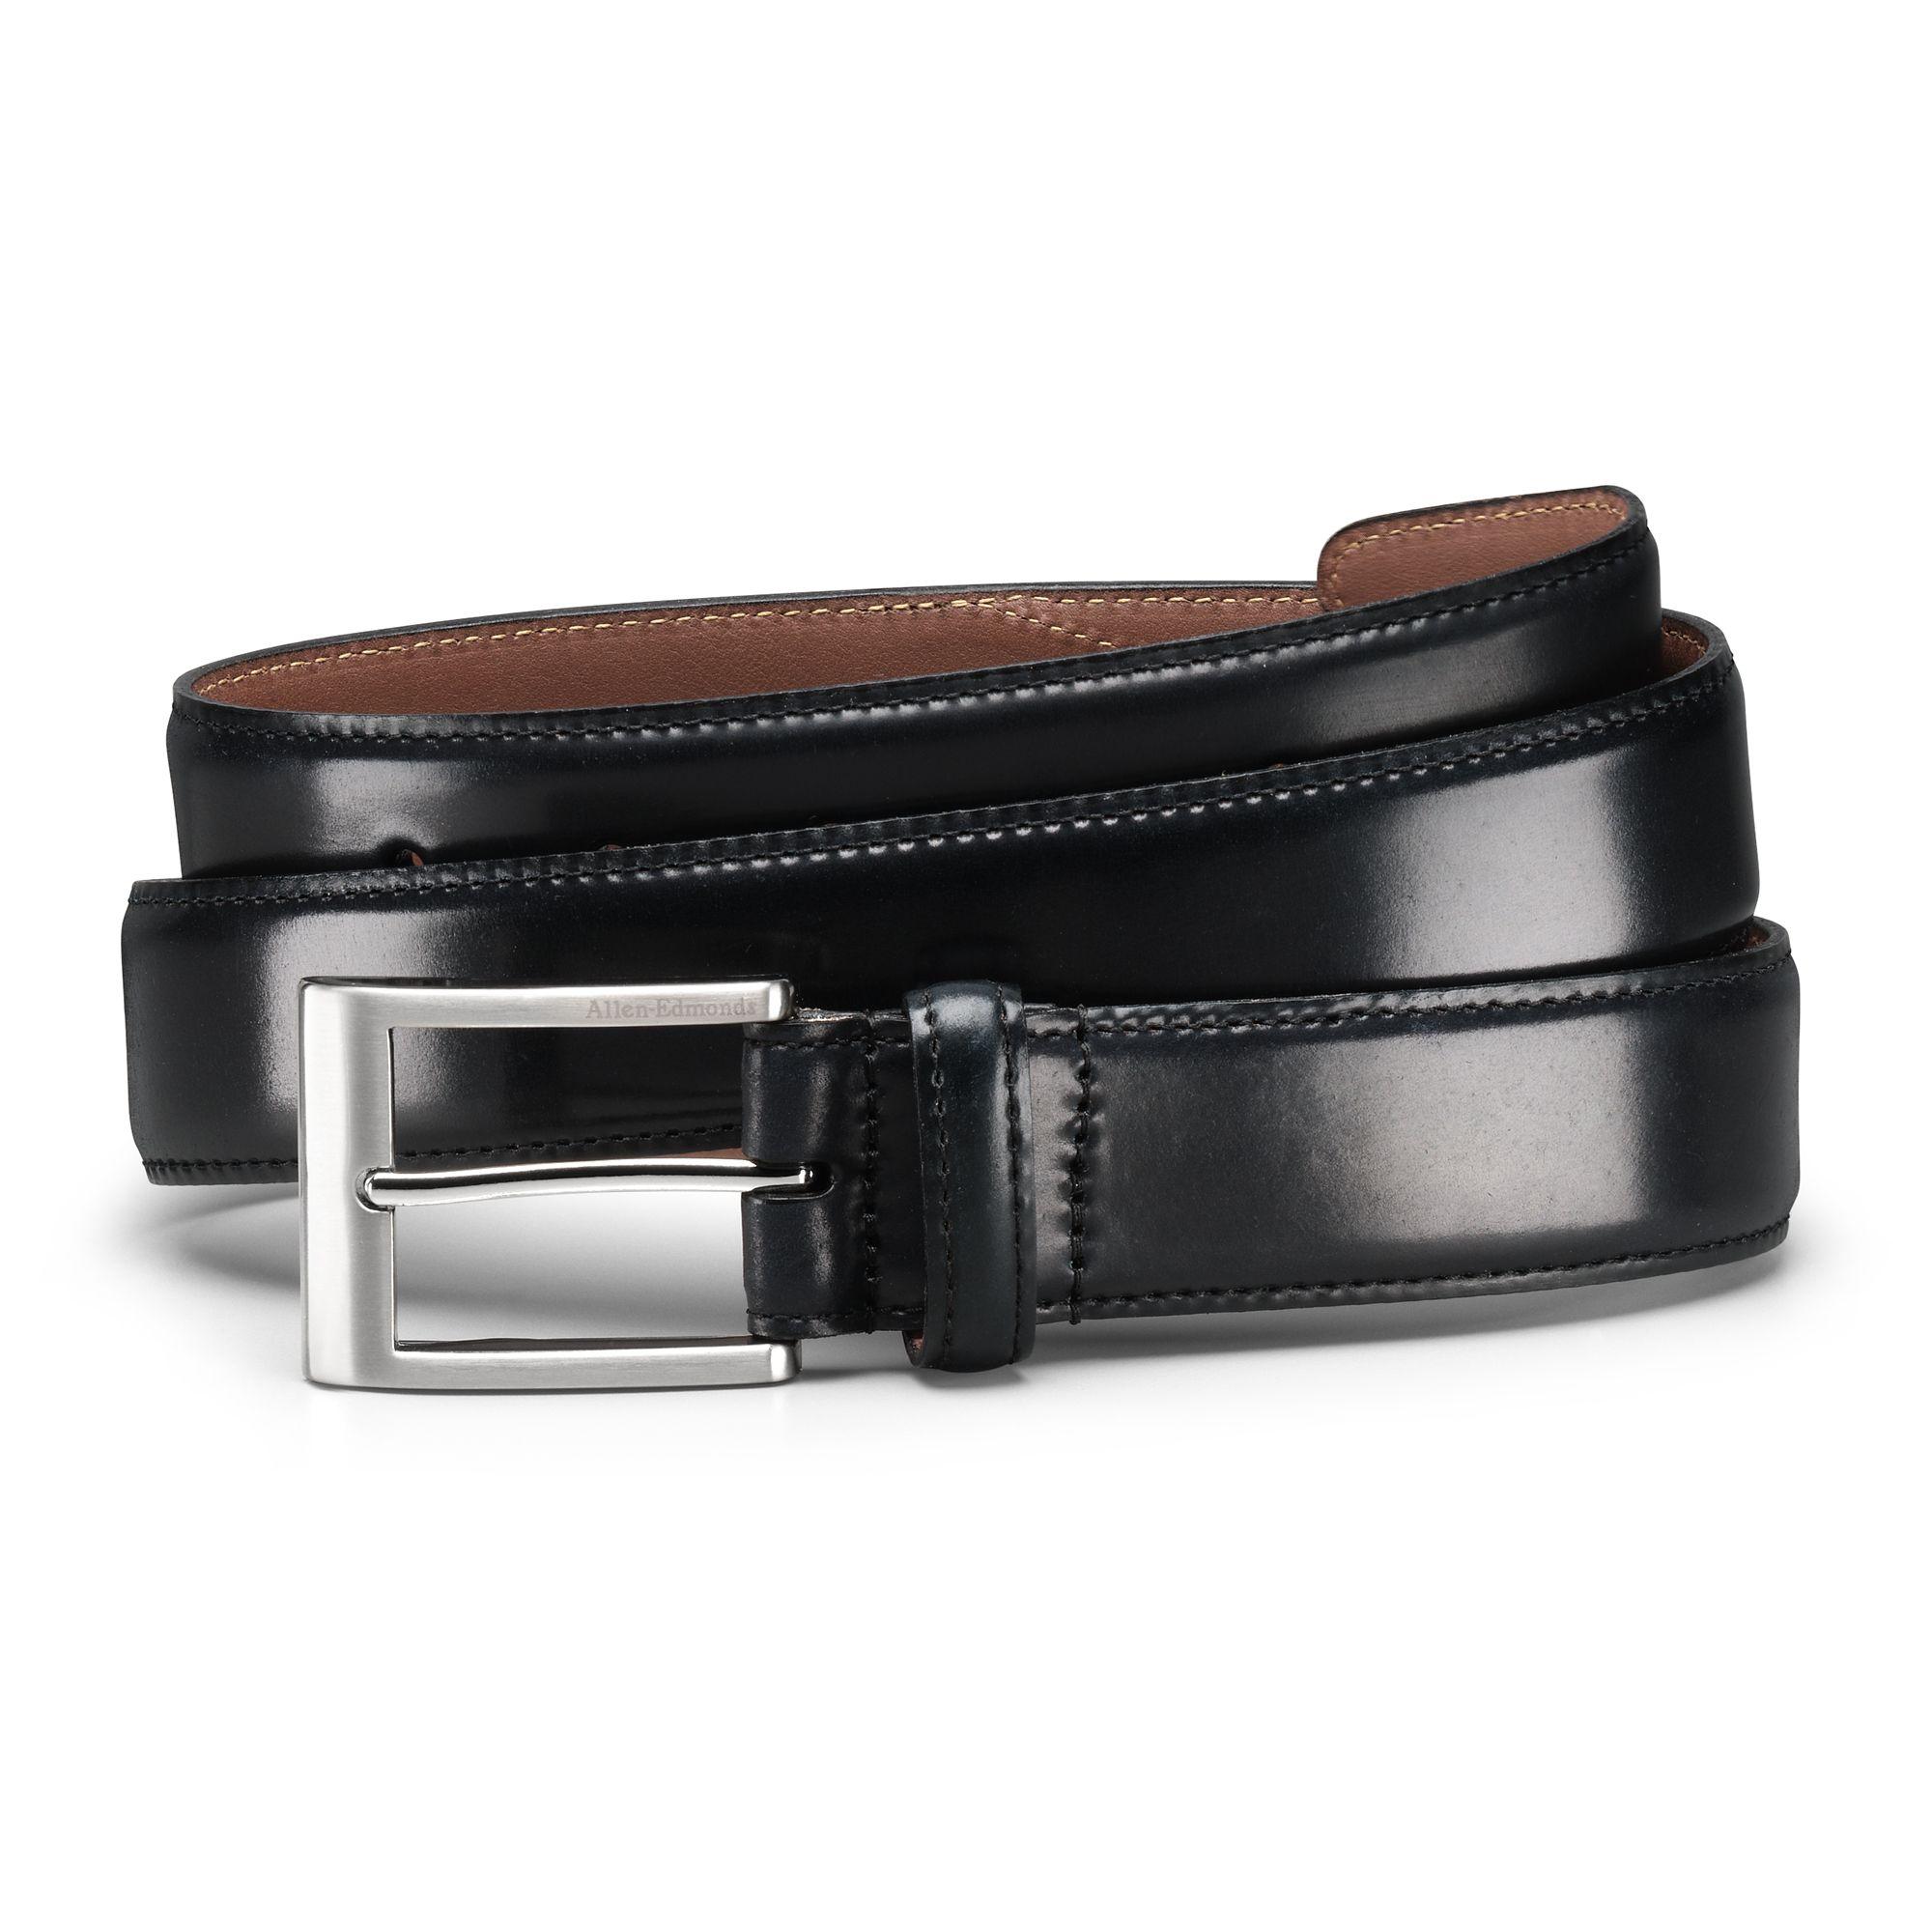 Allen Edmonds Black Horween Shell Cordovan Dress Belt 36